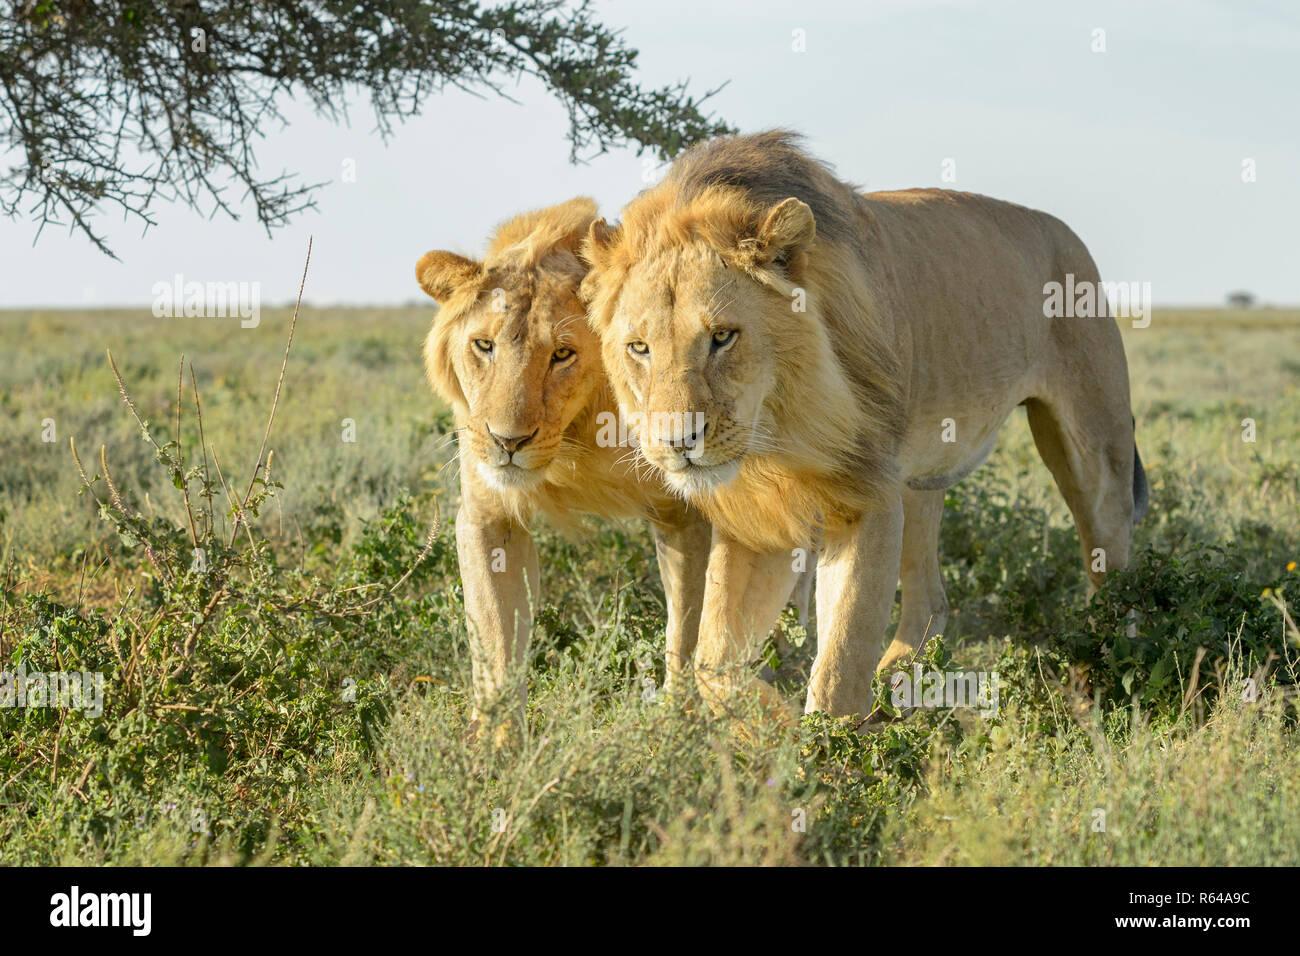 Two male lion (Panthera leo) brothers walking together on savanna, close by, Ngorongoro conservation area, Tanzania. - Stock Image